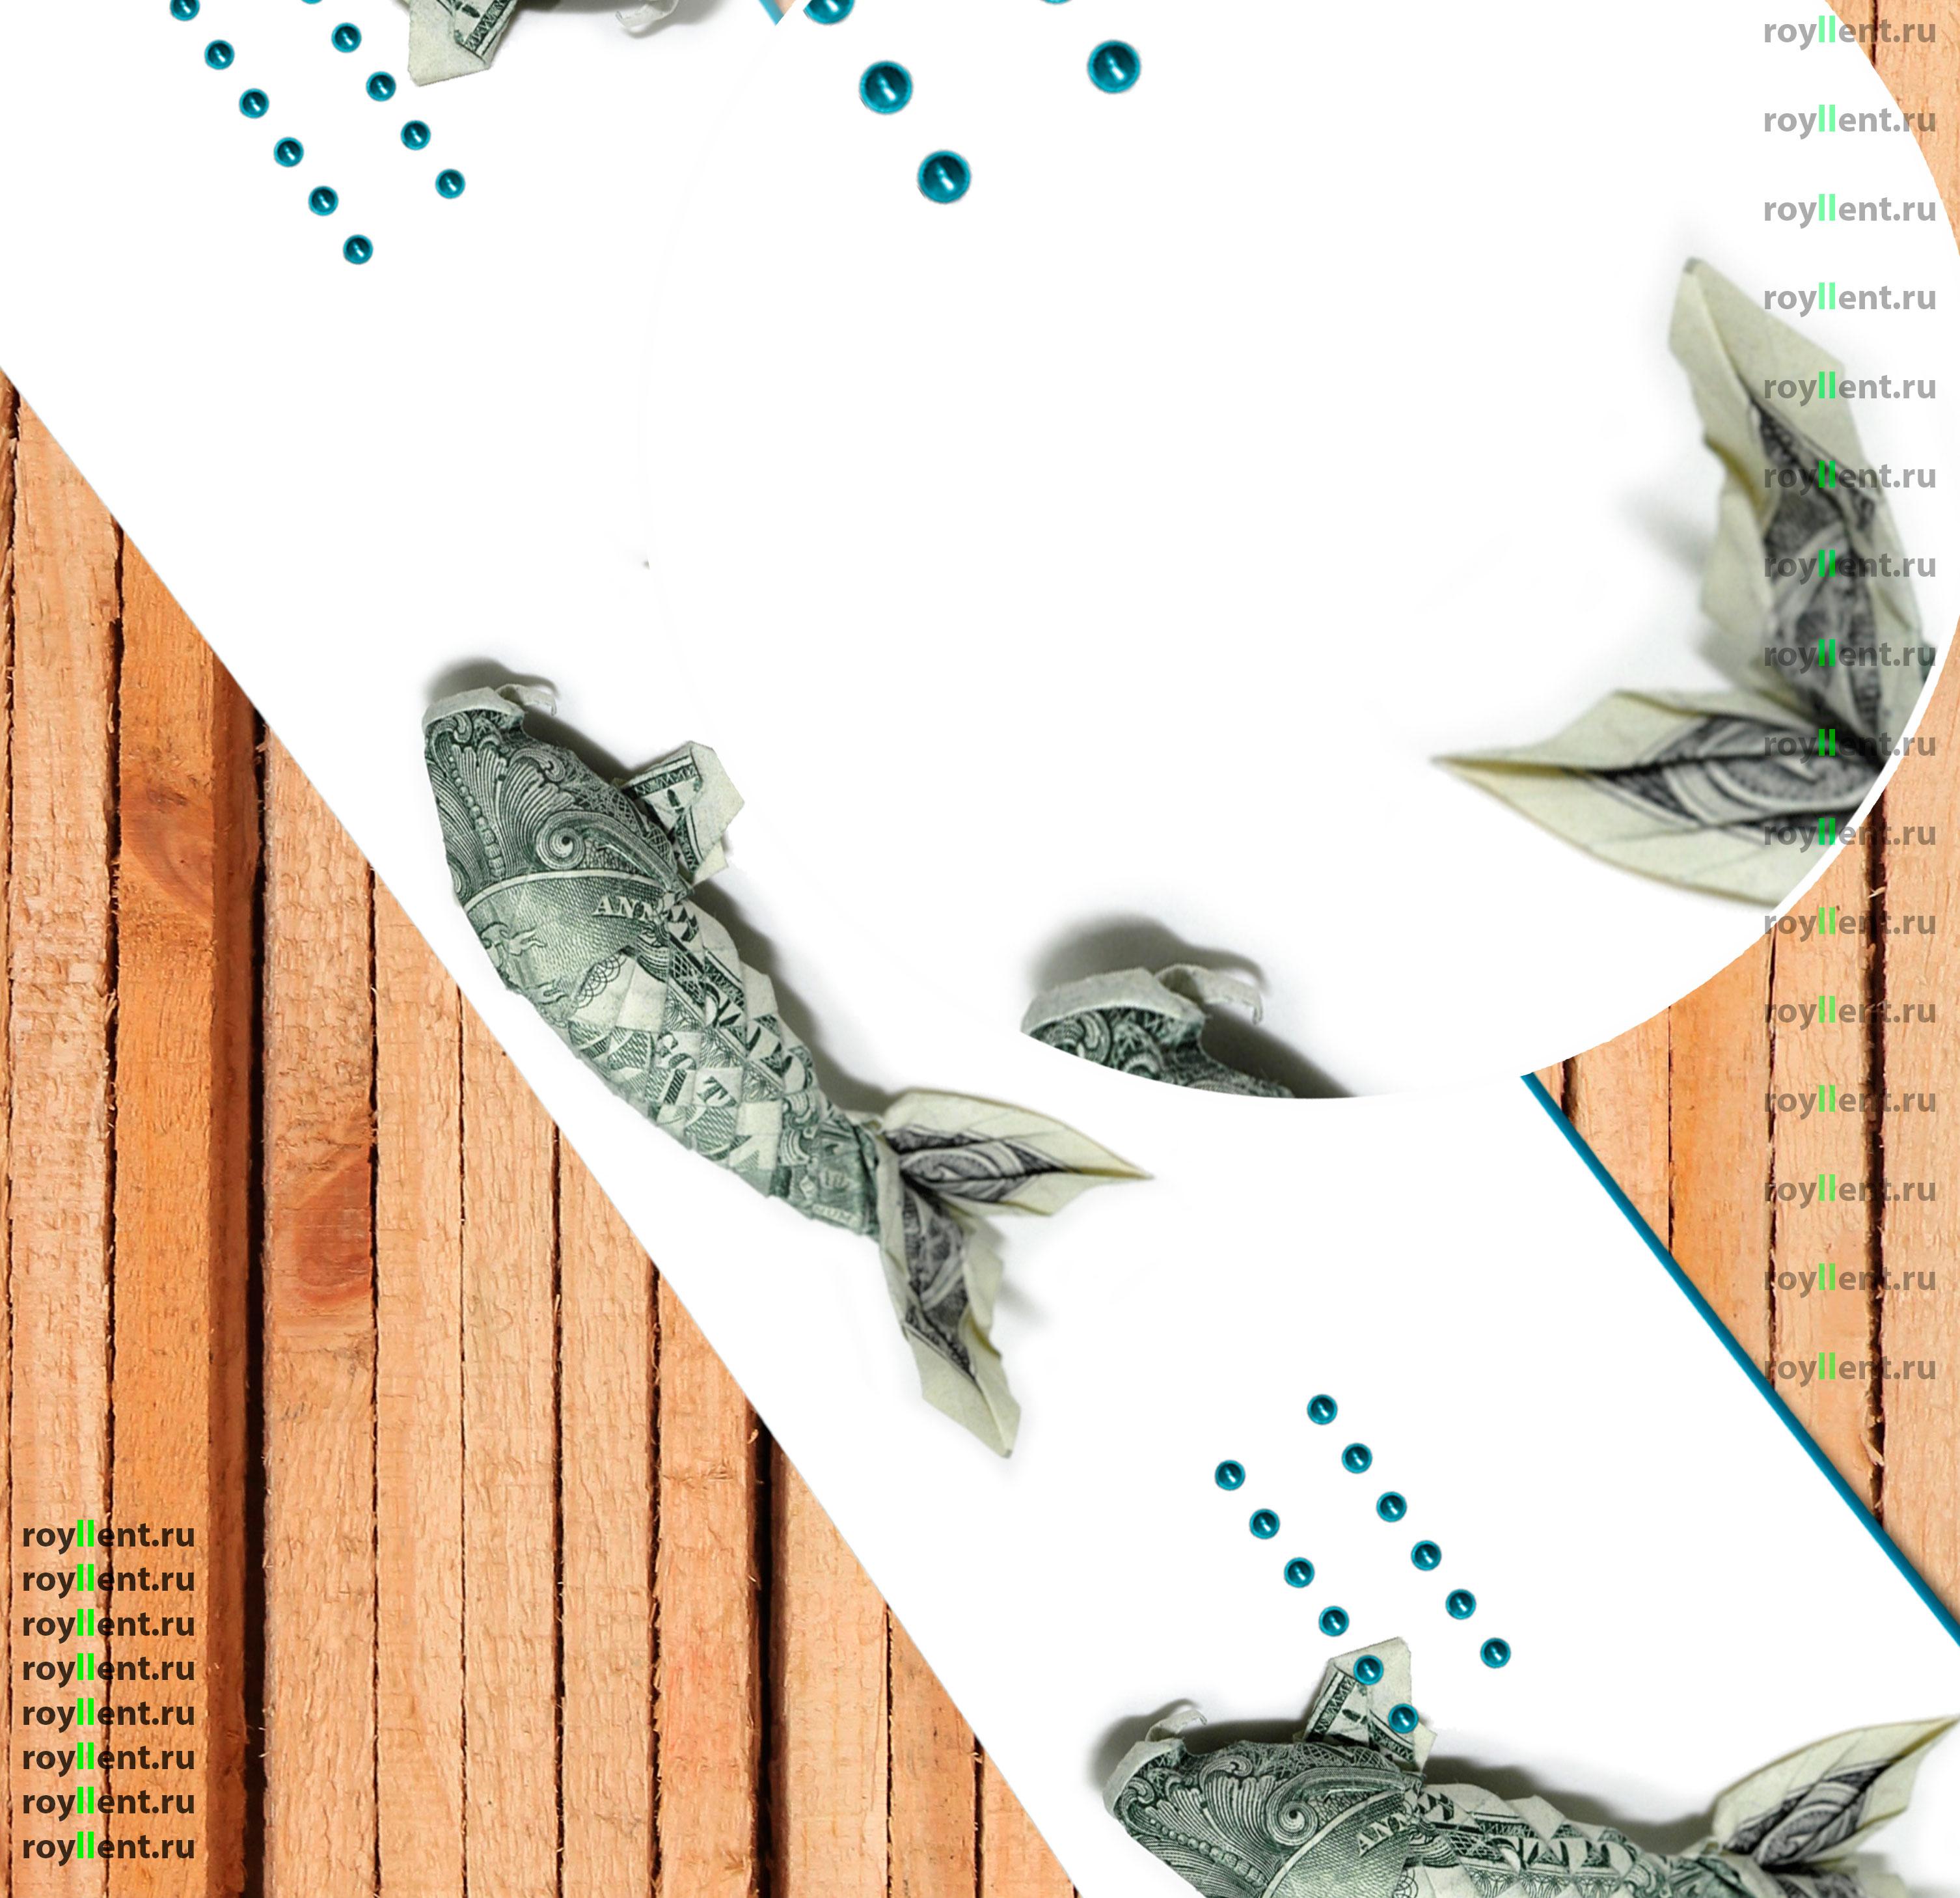 Дизайн сноуборда в стиле доллара рыбки приносит удачу